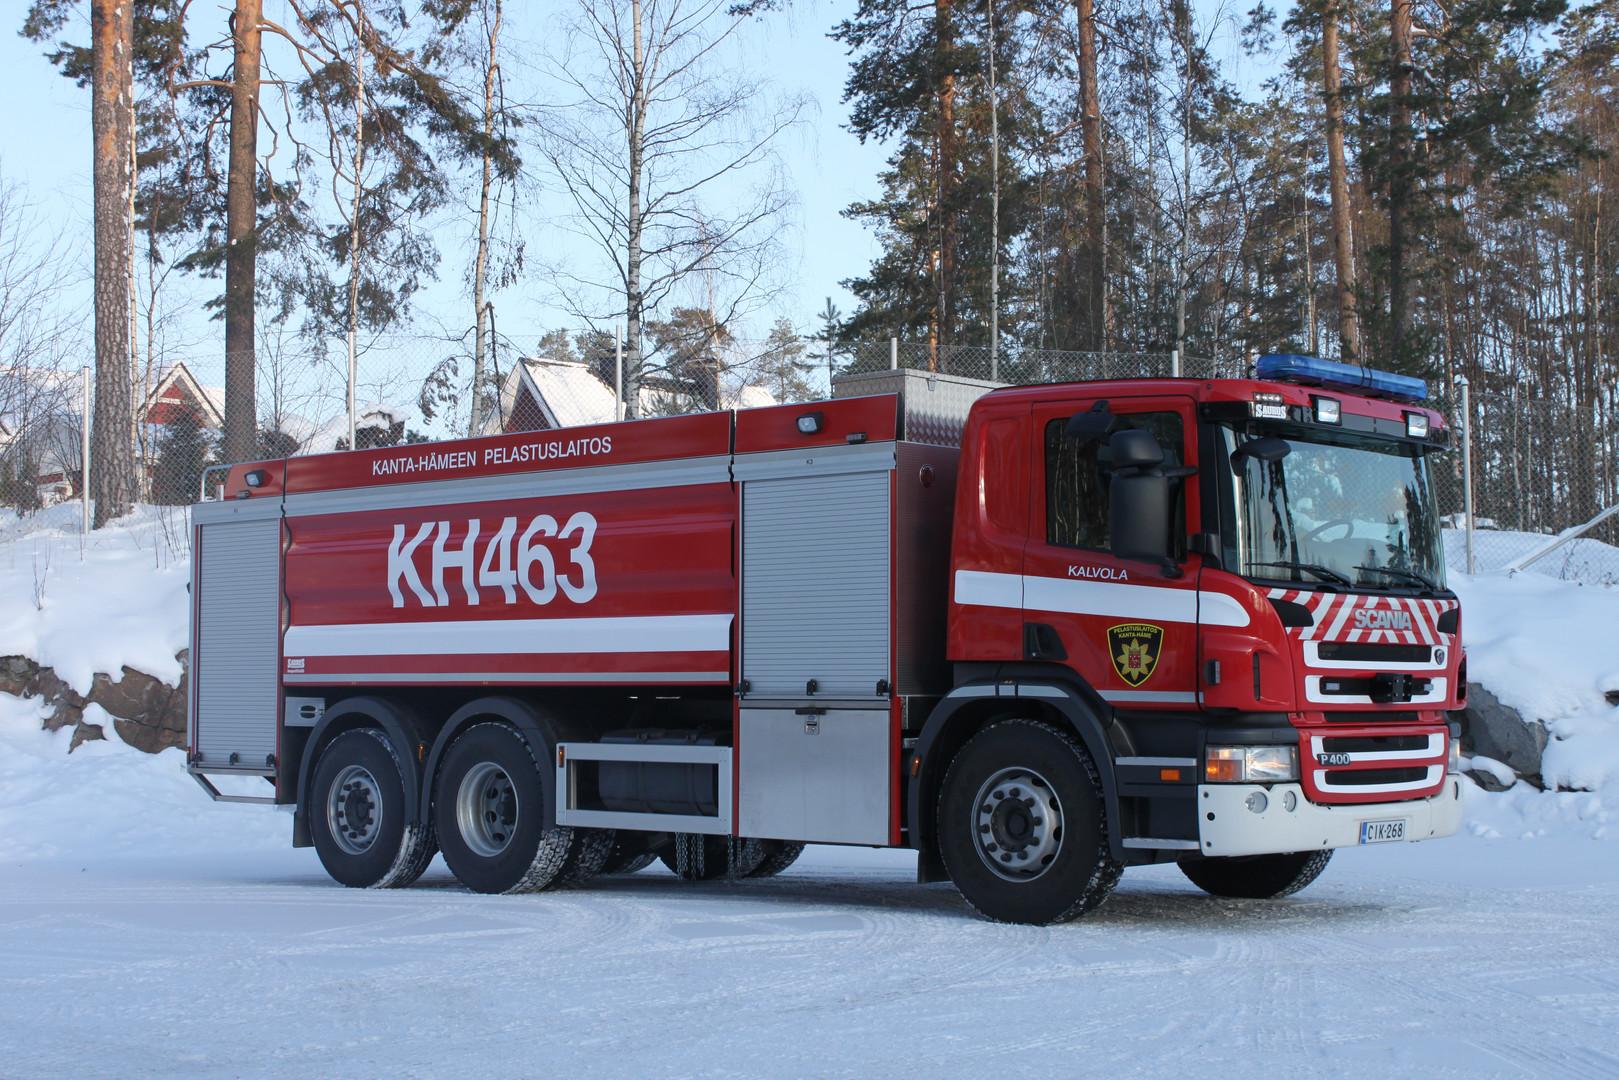 KH463